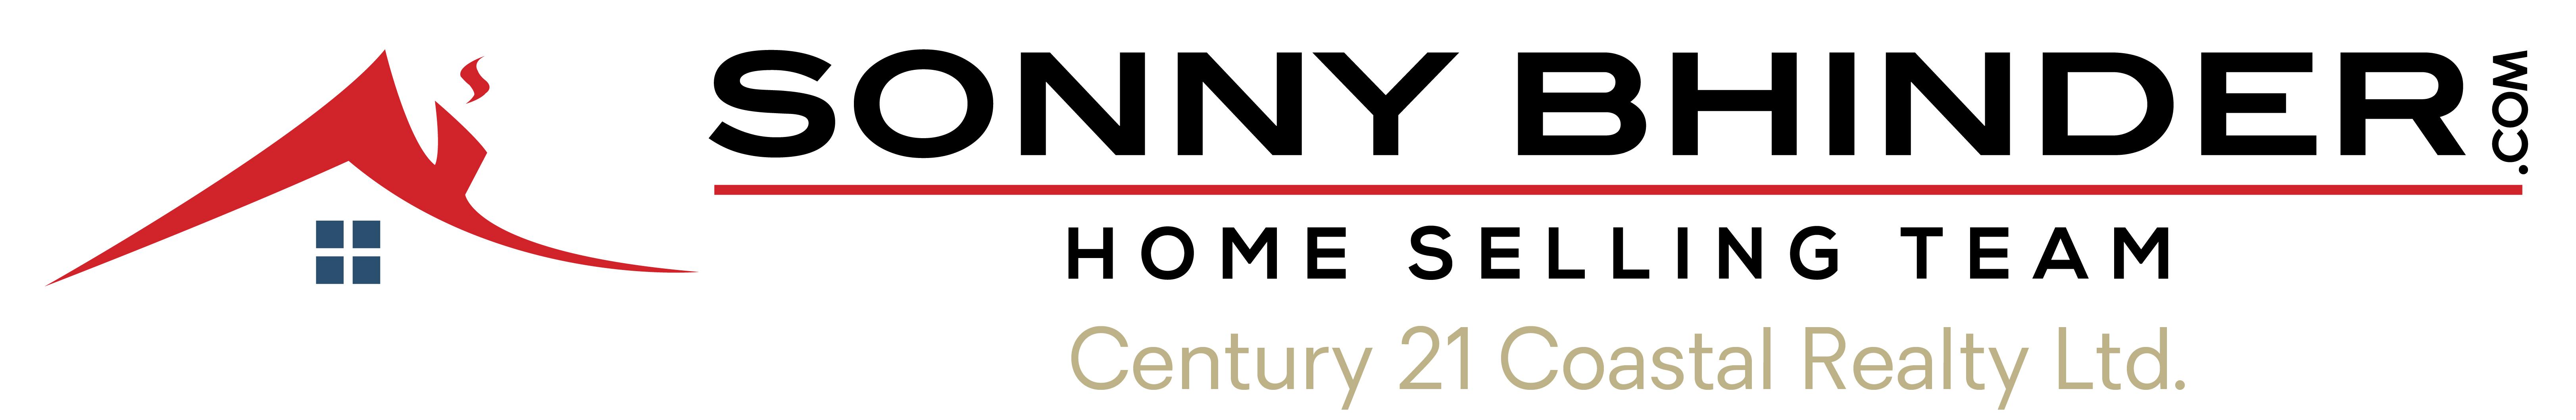 Sonny Bhinder Home Selling Team logo